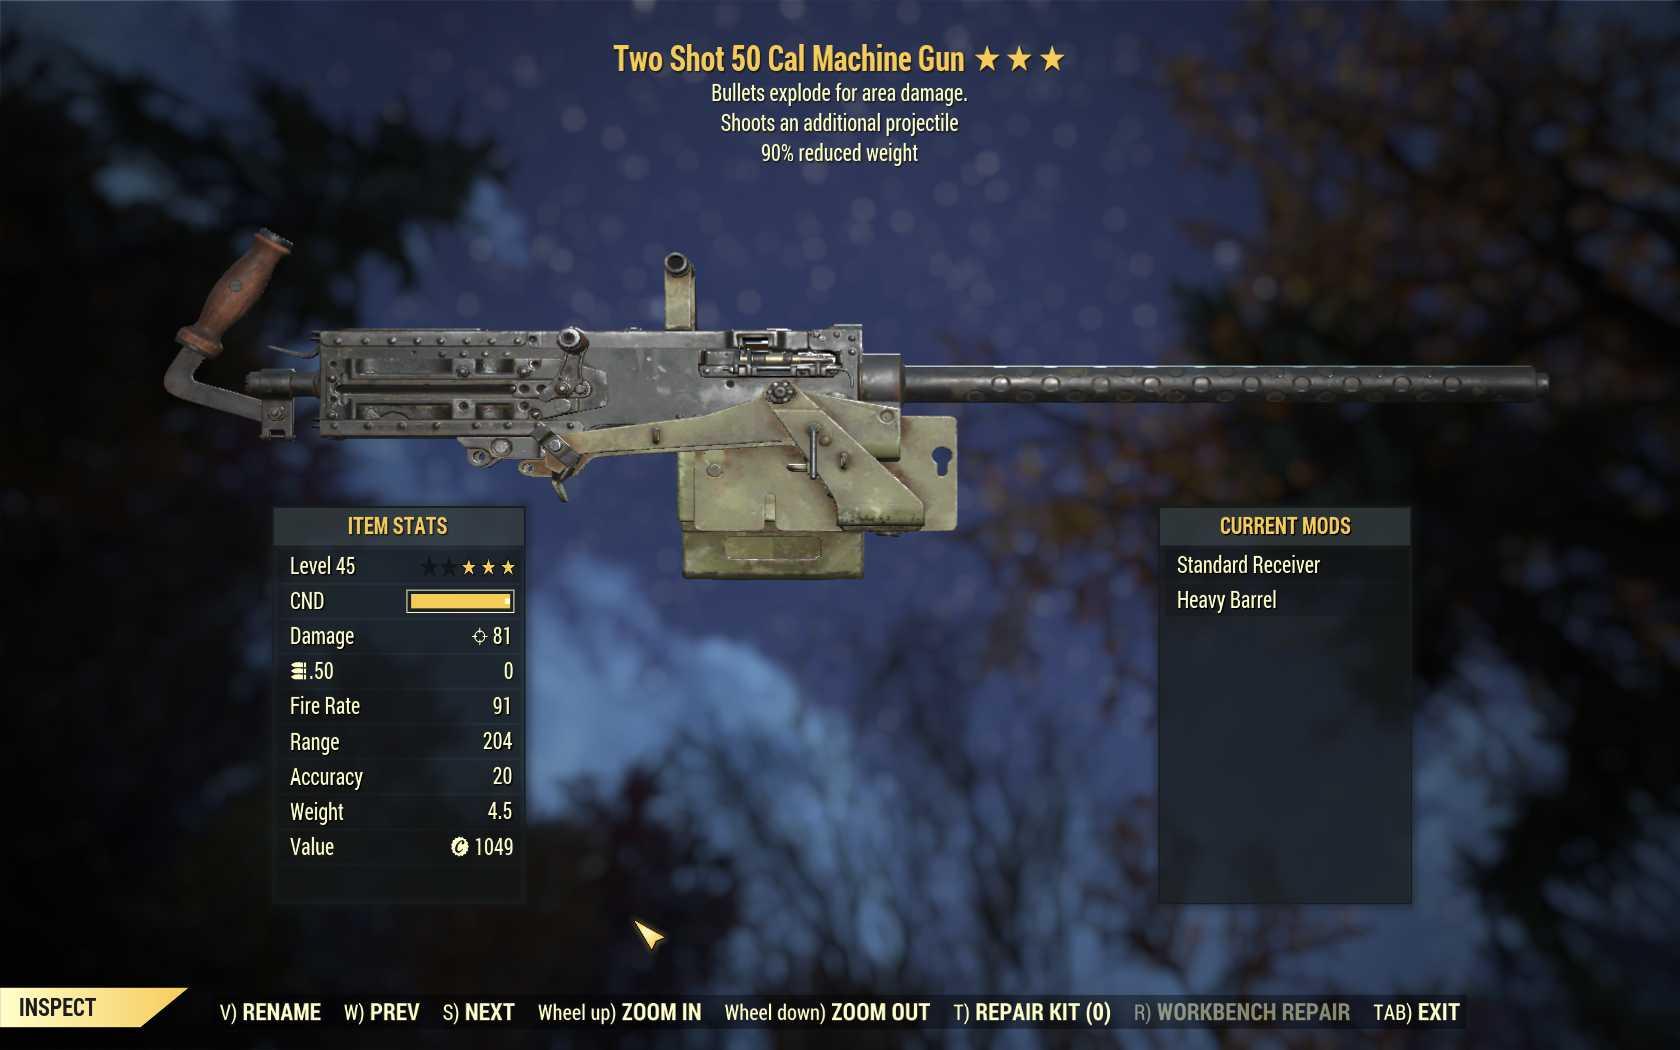 Two Shot Explosive 50 Cal Machine Gun (90% reduced weight)